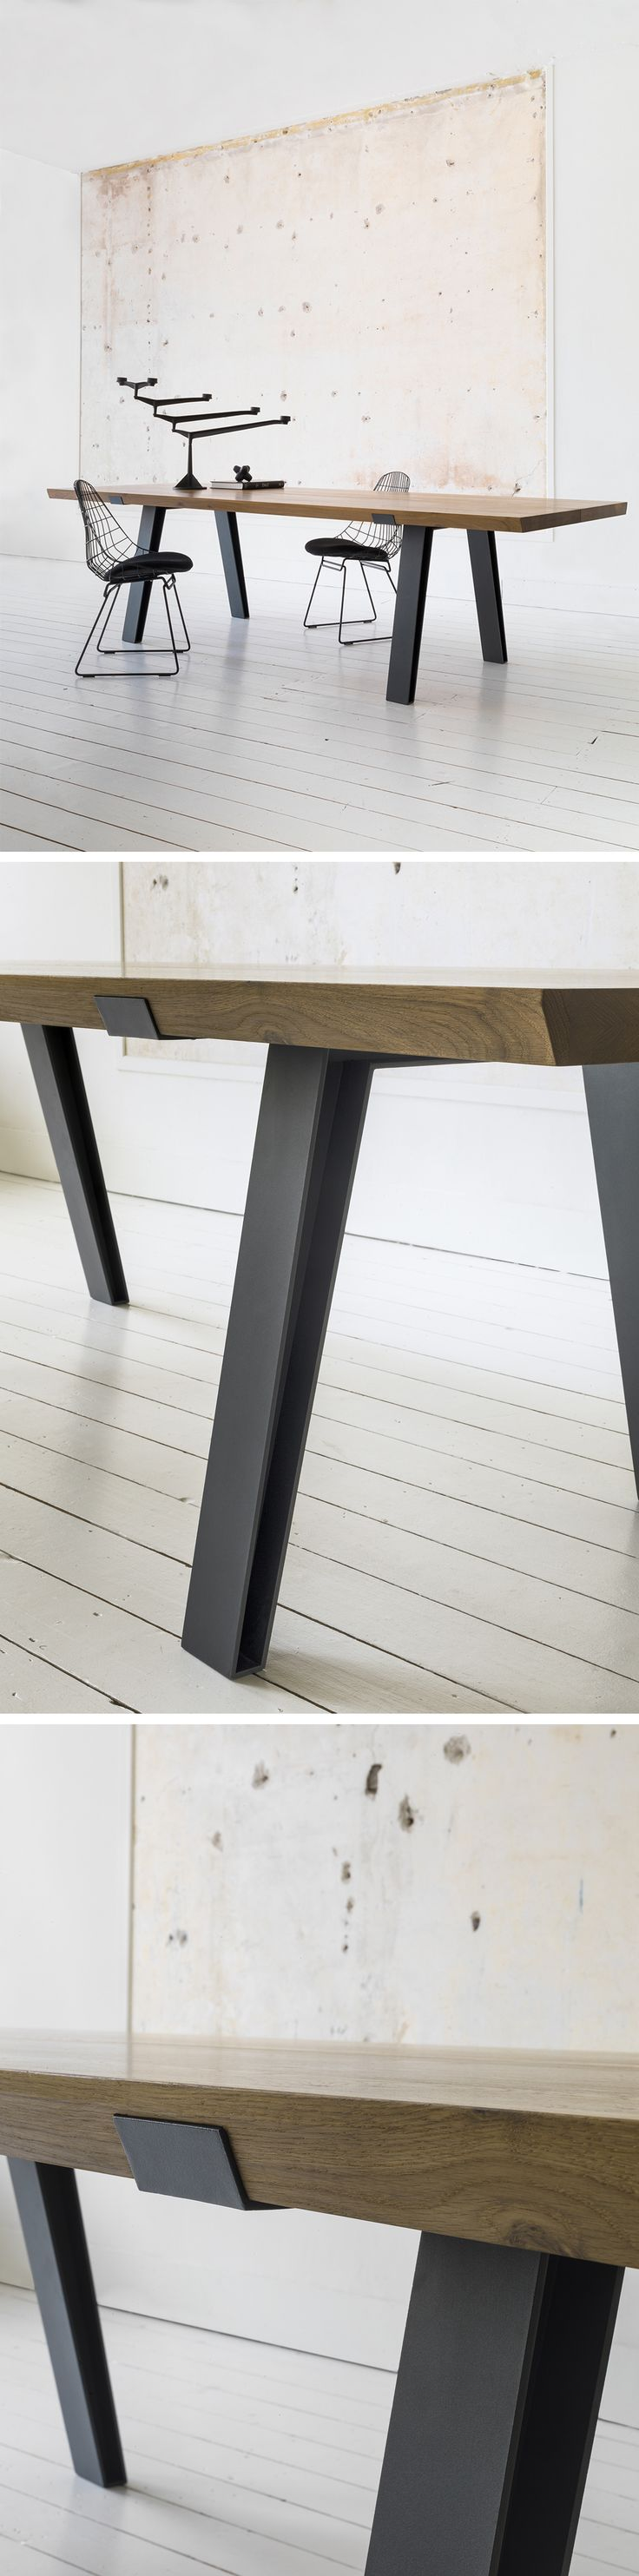 Best 25+ Table legs ideas on Pinterest | Diy table legs ...